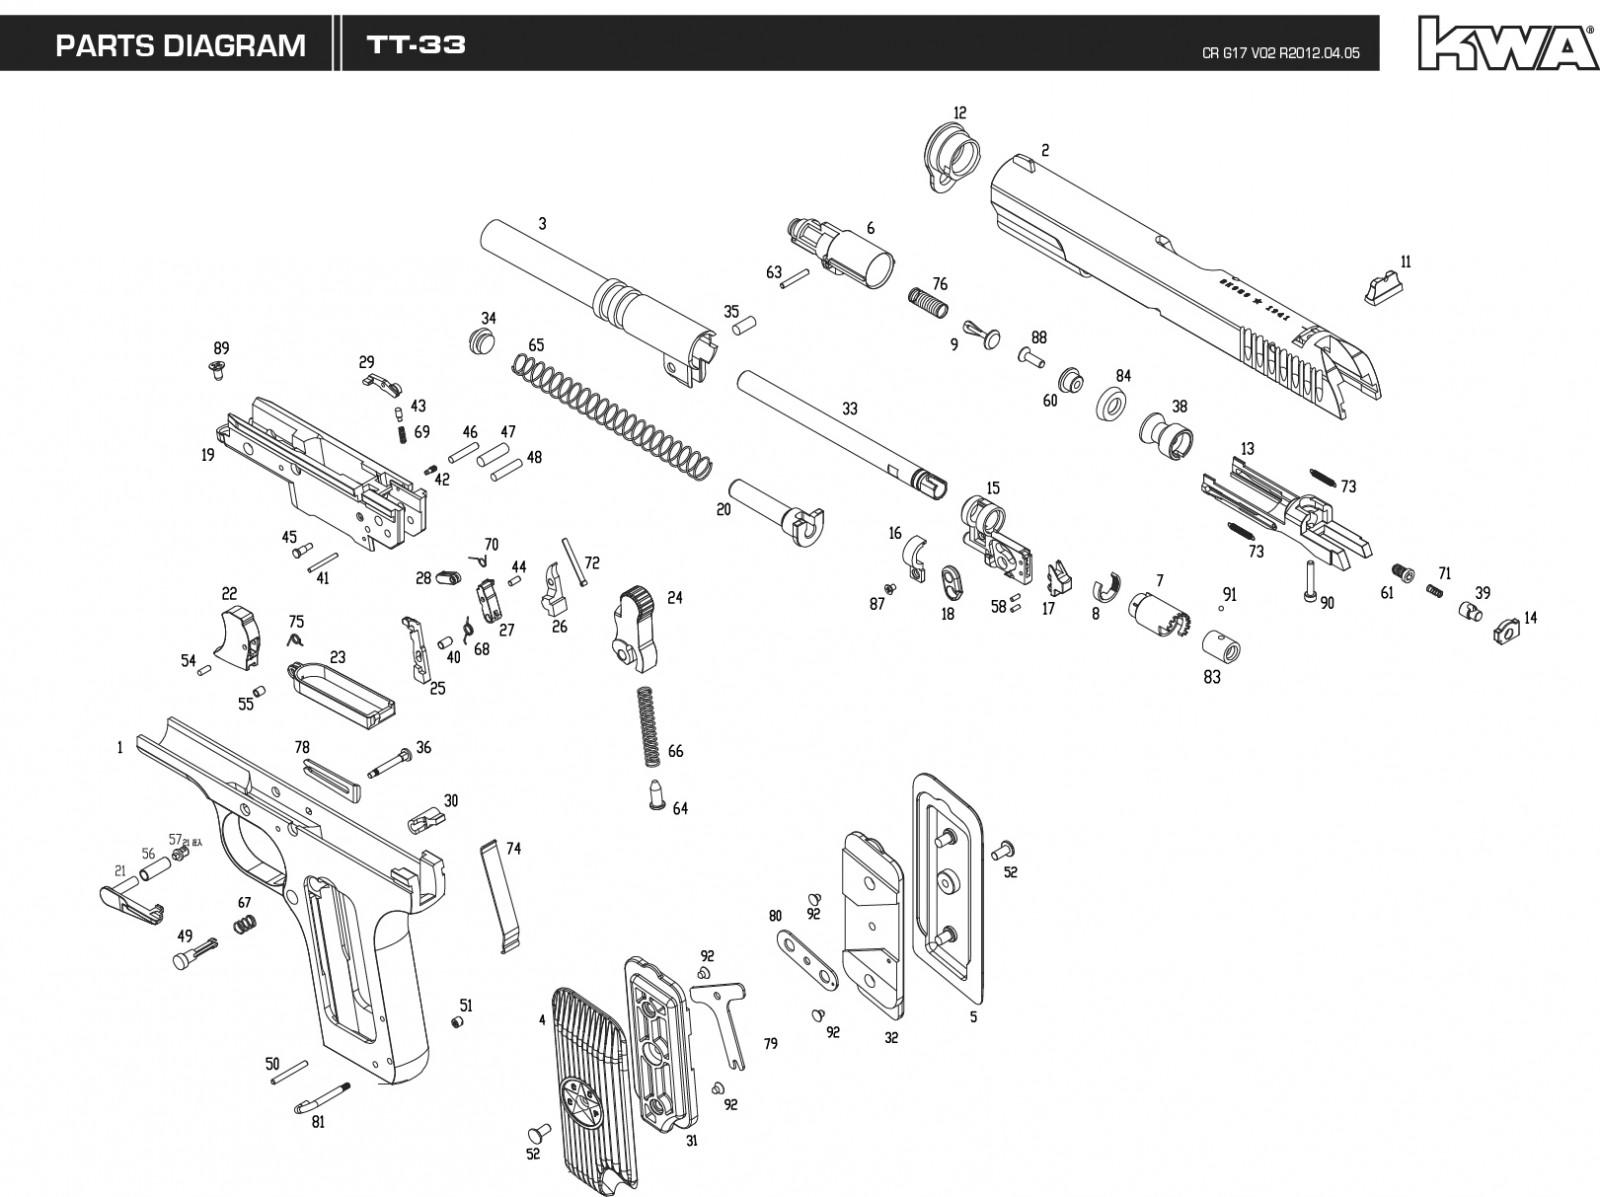 Exploded Diagram Kwa Tt33 Tokarev Ksc Part Original Worldwide Shipping